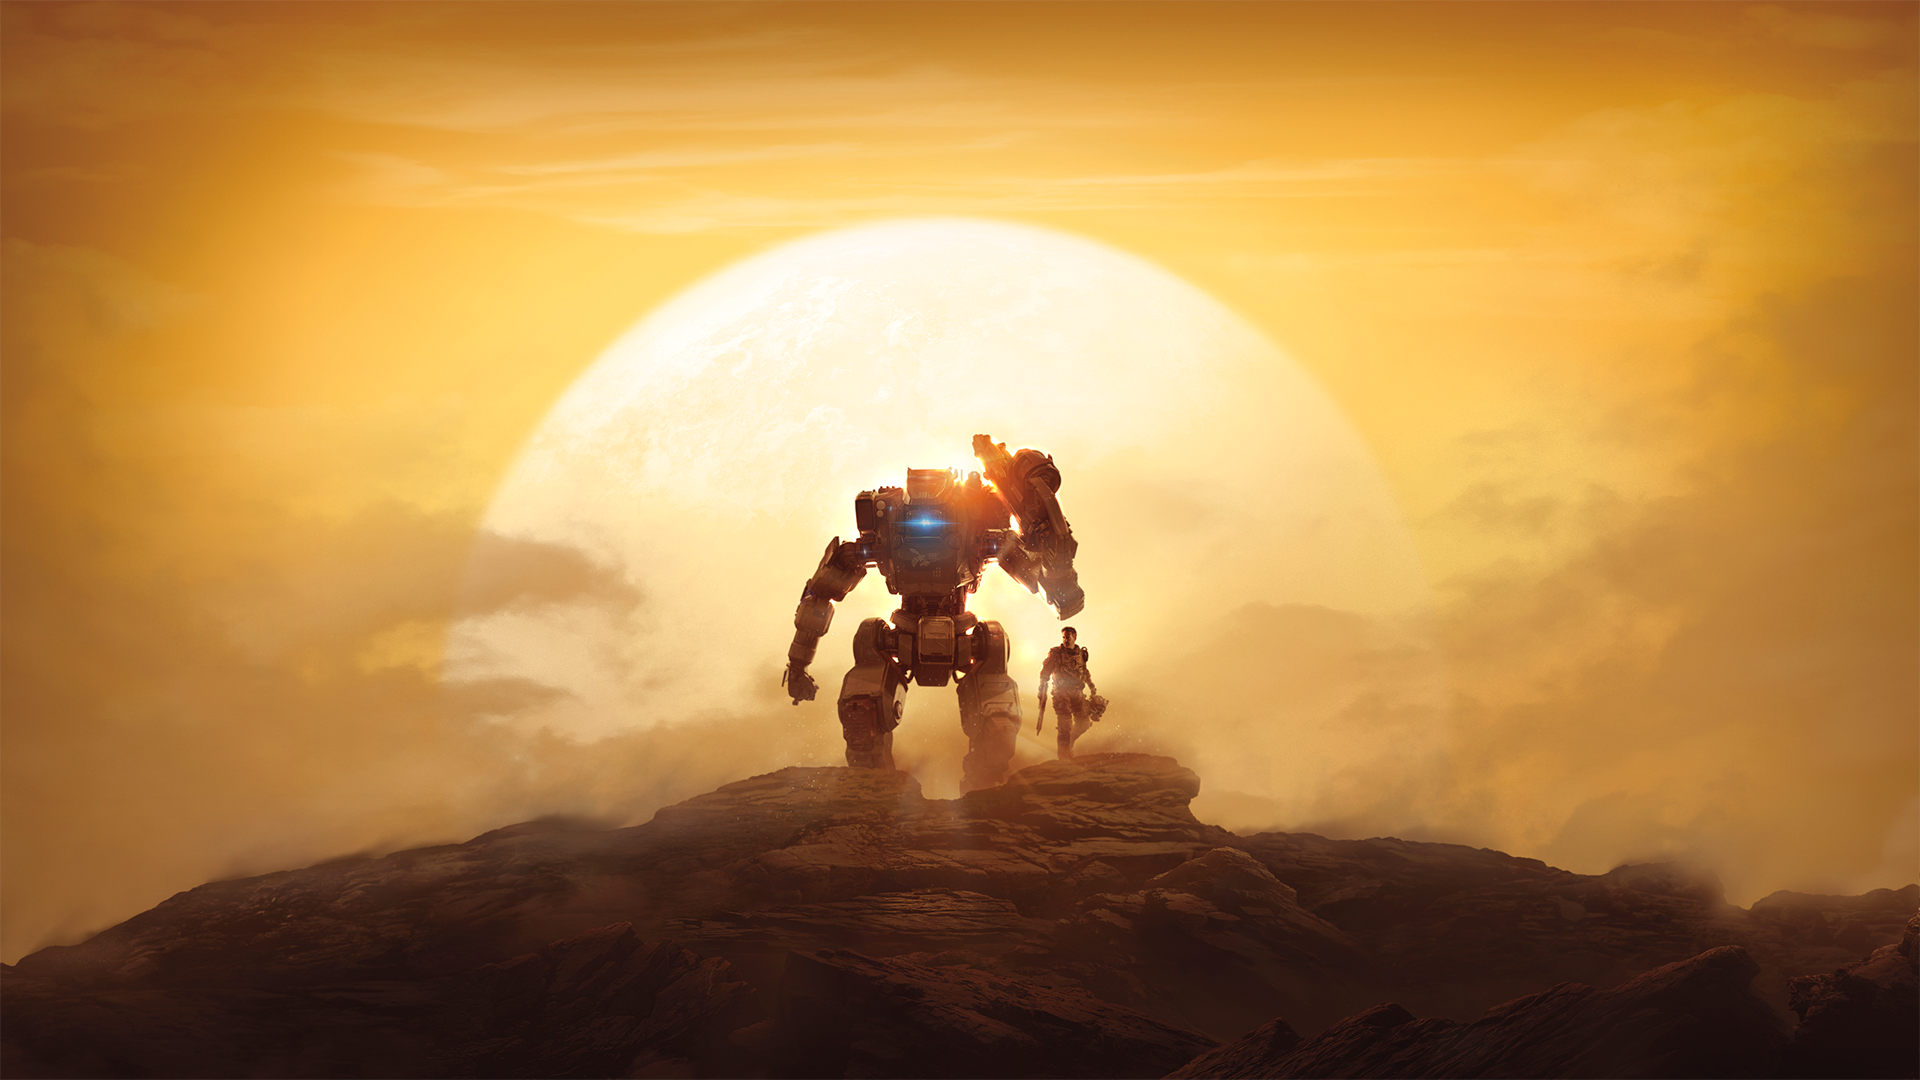 Горизонт - Titanfall 2 Арт